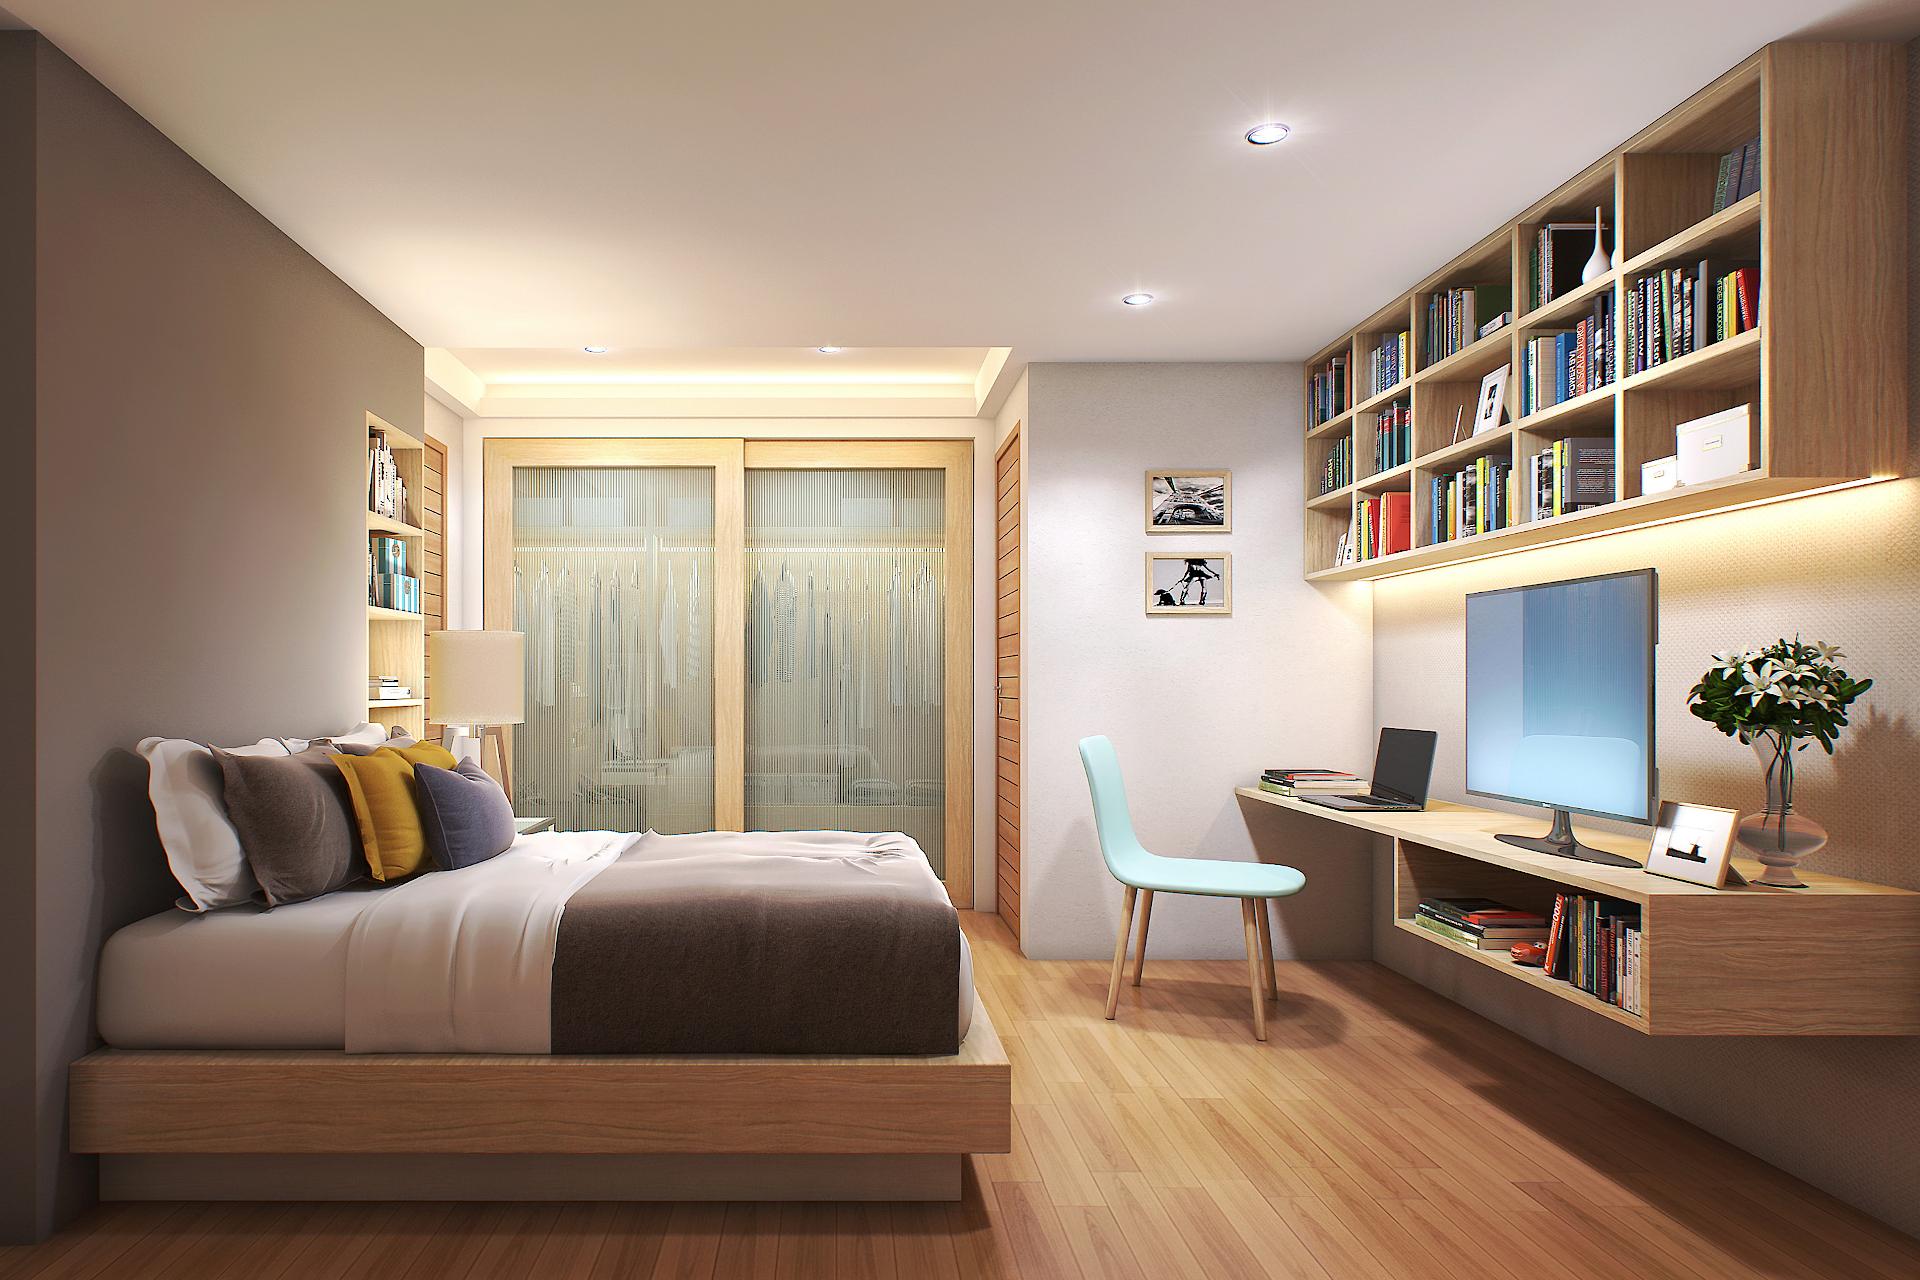 009_bedroom1.jpg